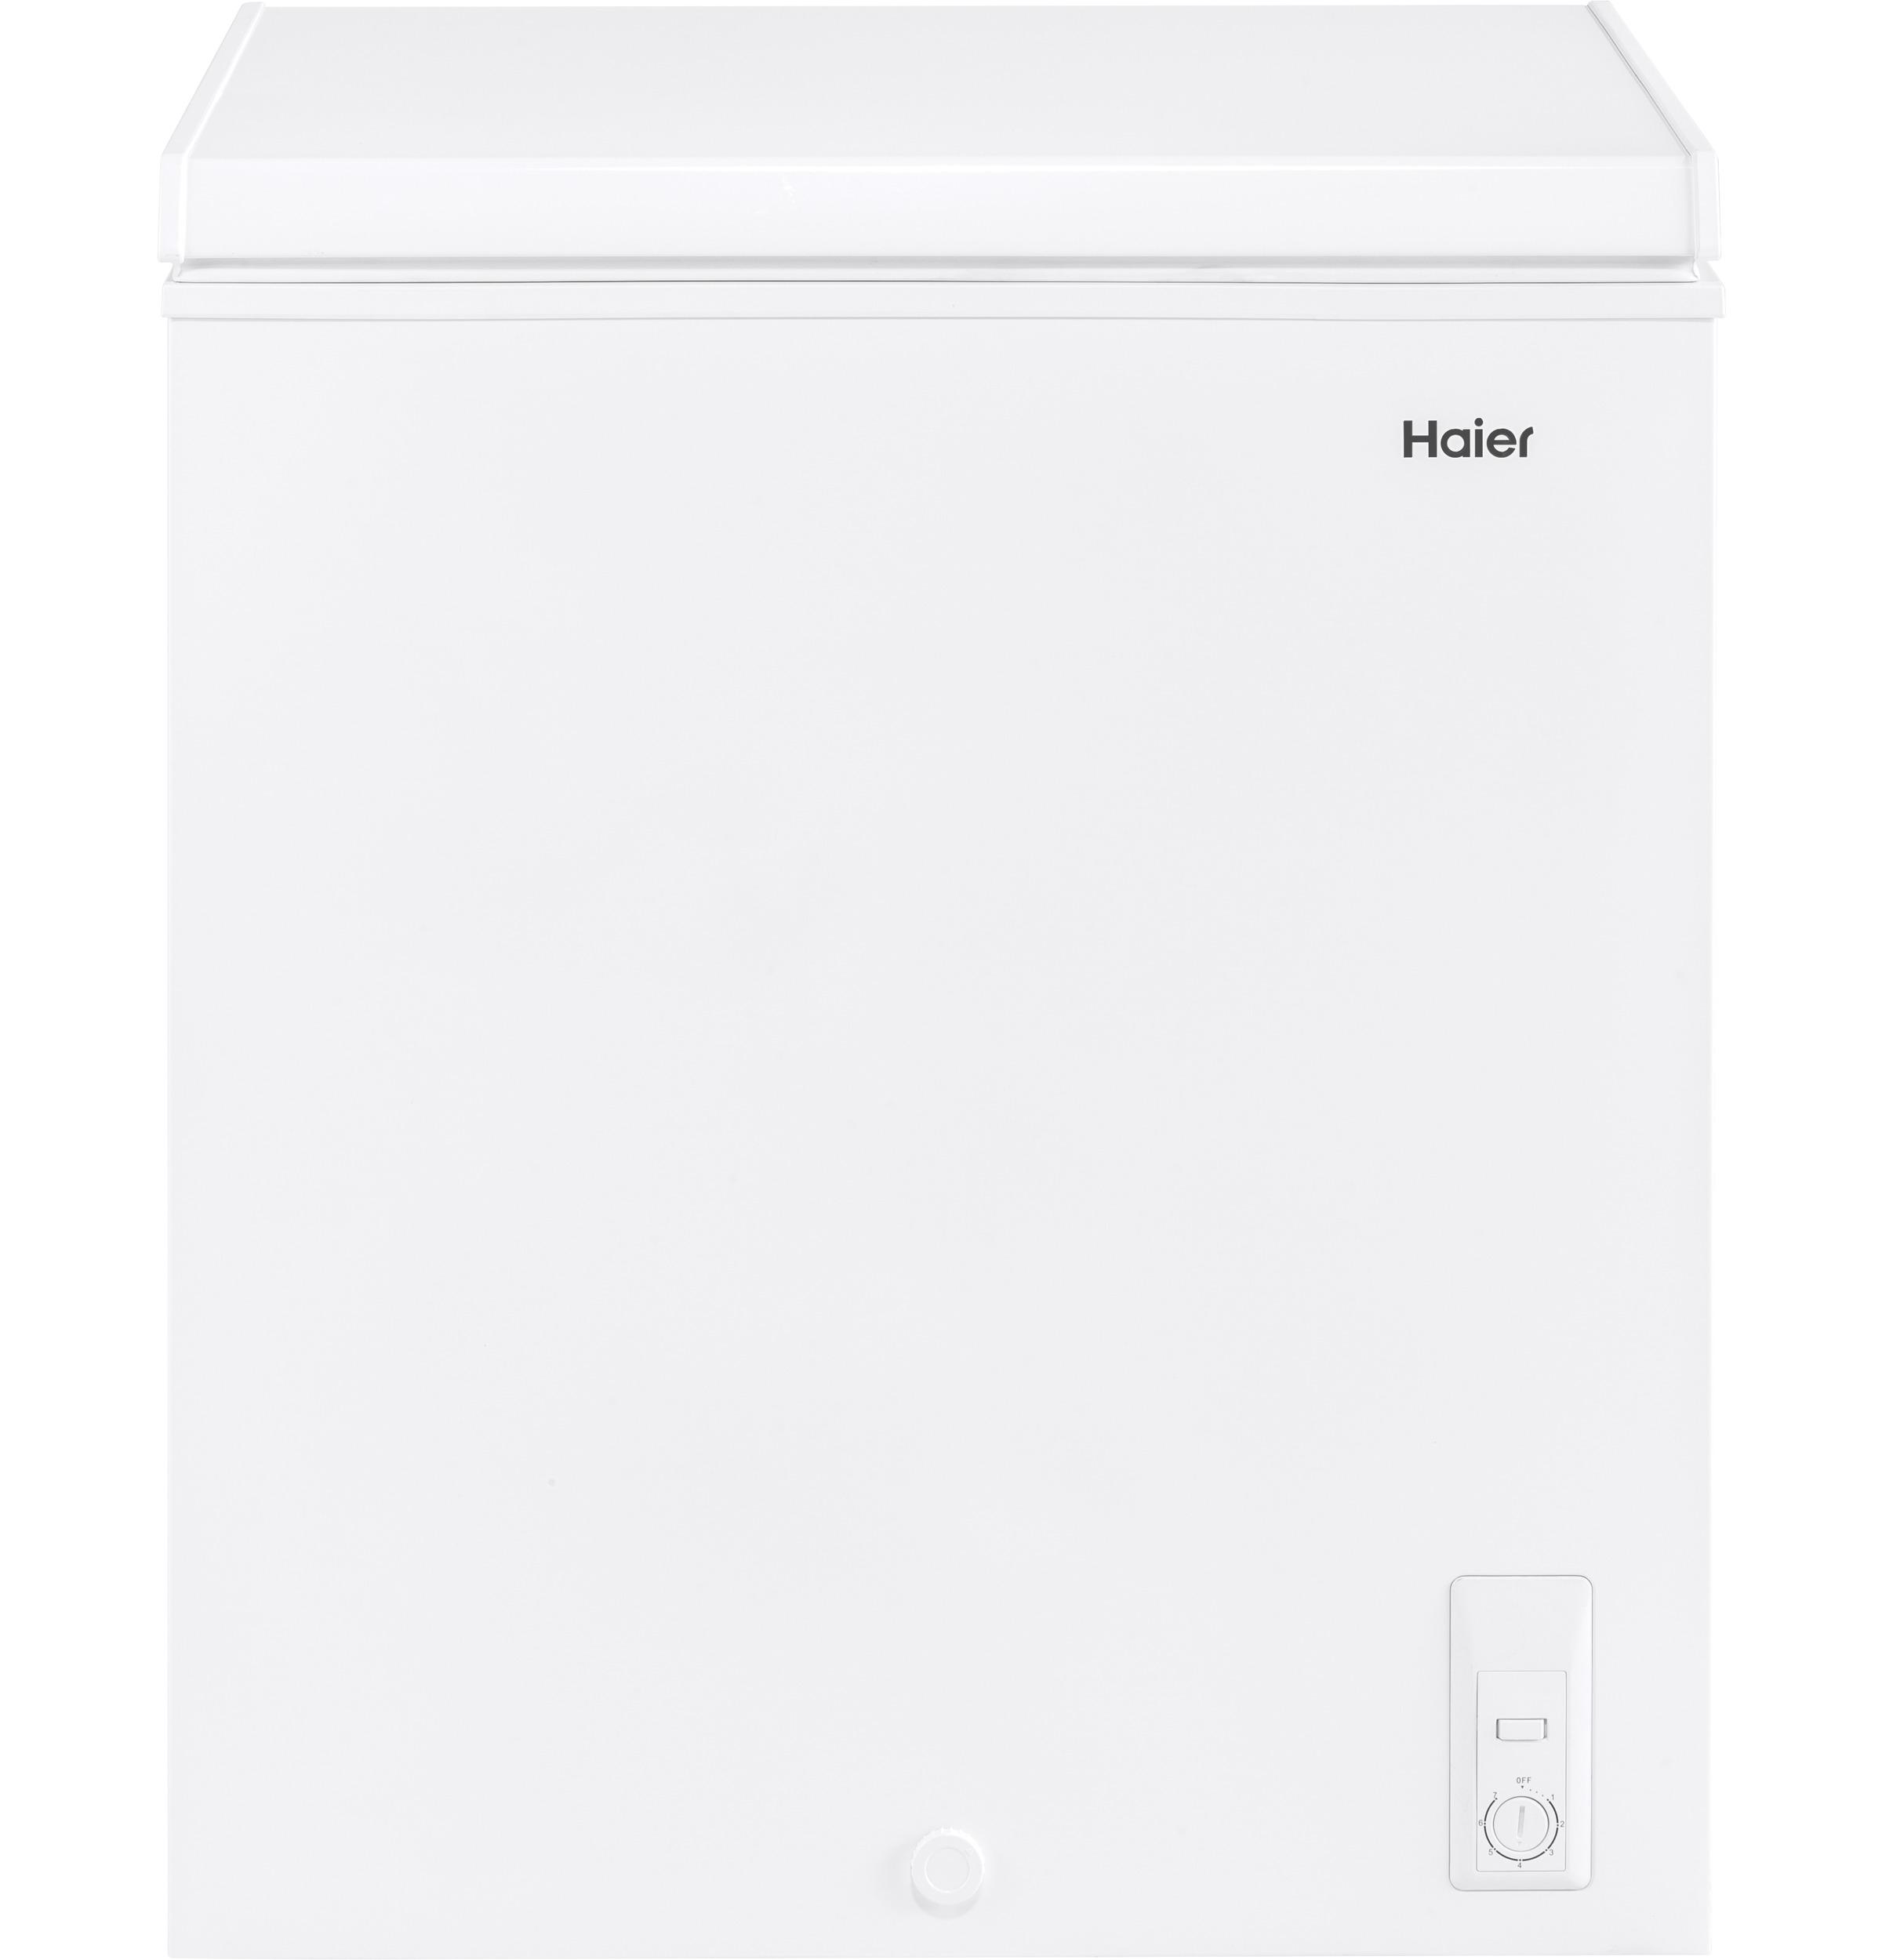 Haier 5.0 Cu. Ft. Capacity Chest Freezer